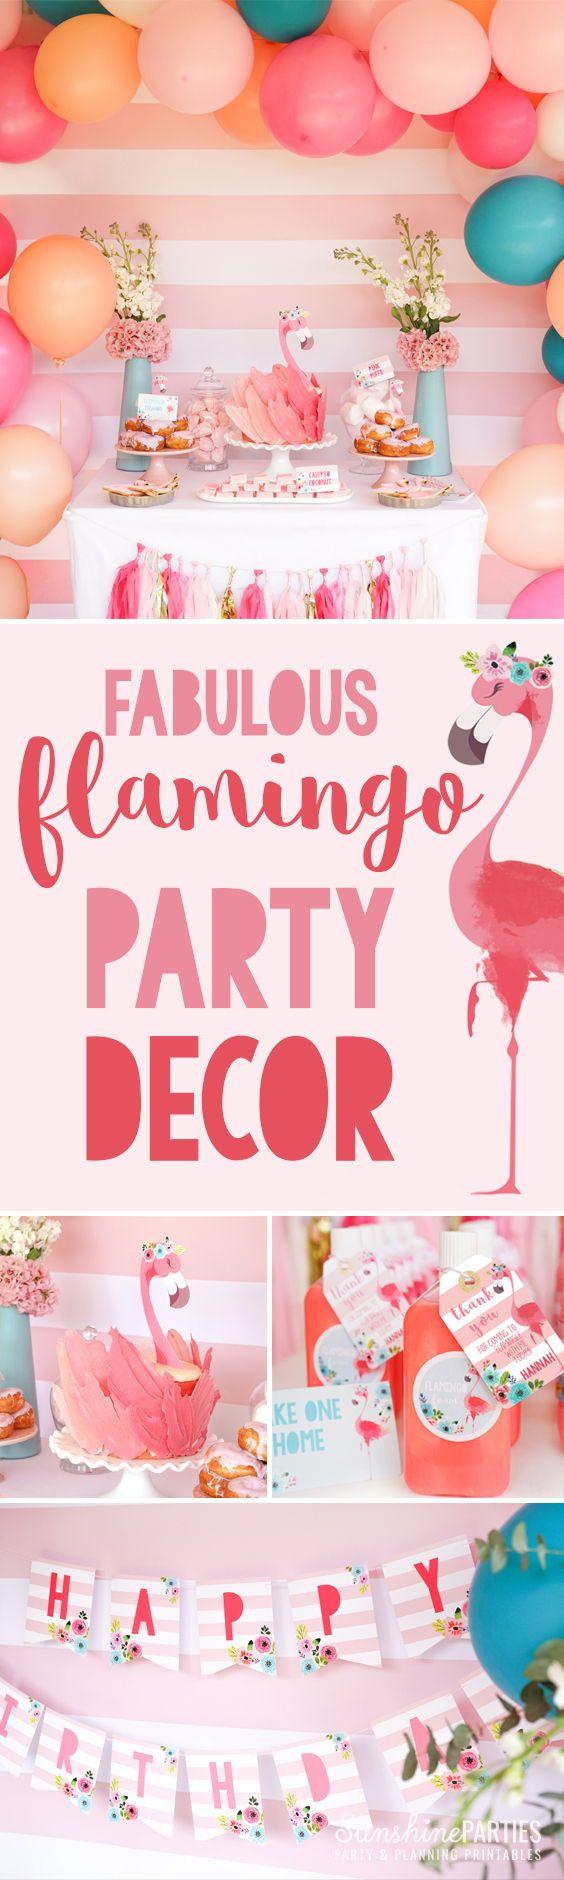 Fun Flamingo themed birthday party ideas! | kid's party ideas | summer party ideas |